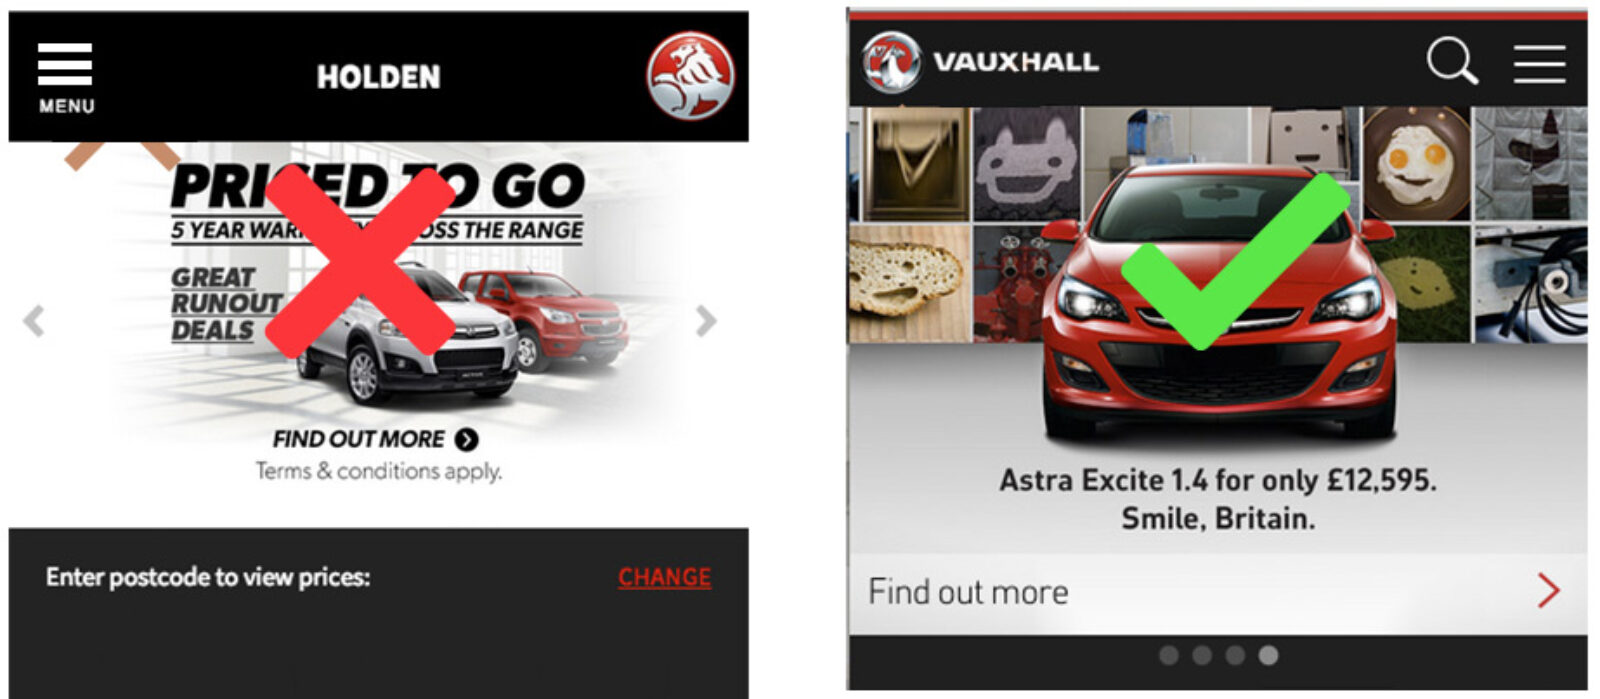 UK Vauxhall site vs Holden site